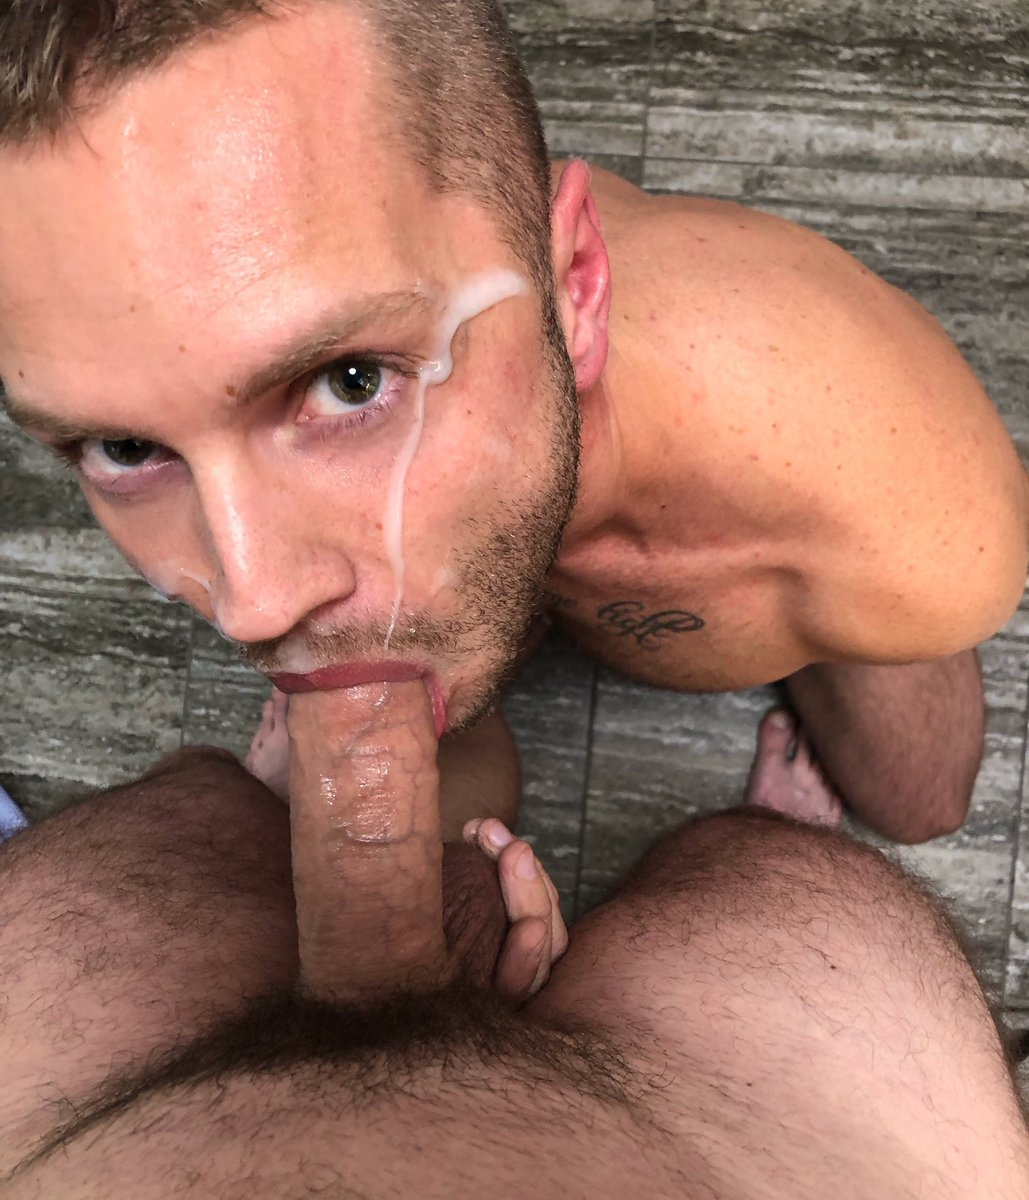 Www hardcore gay porn com